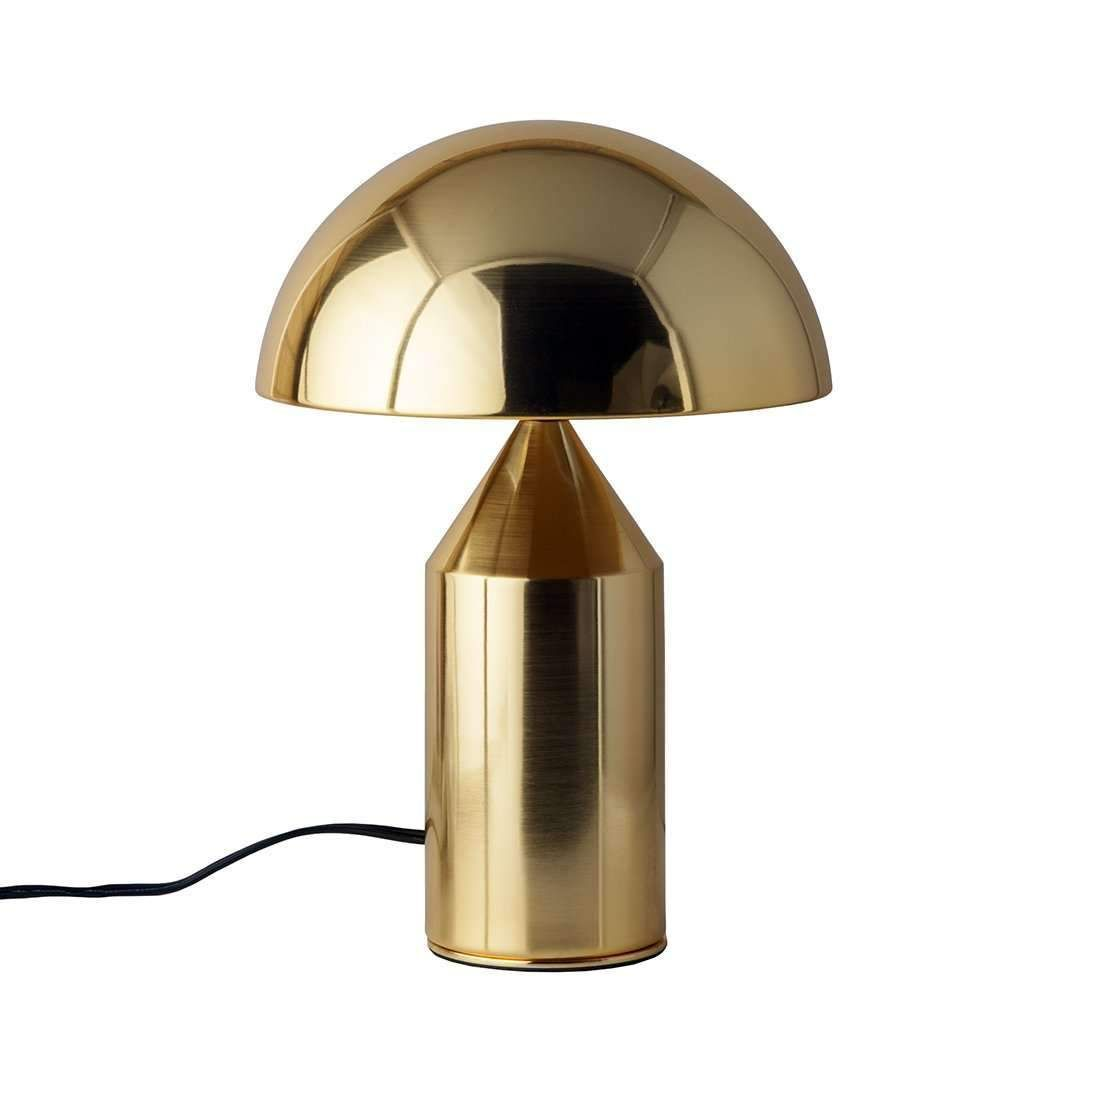 Mid Century Mushroom Table Lamp Brass In 2020 Brass Table Lamps Contemporary Table Lamps Table Lamp